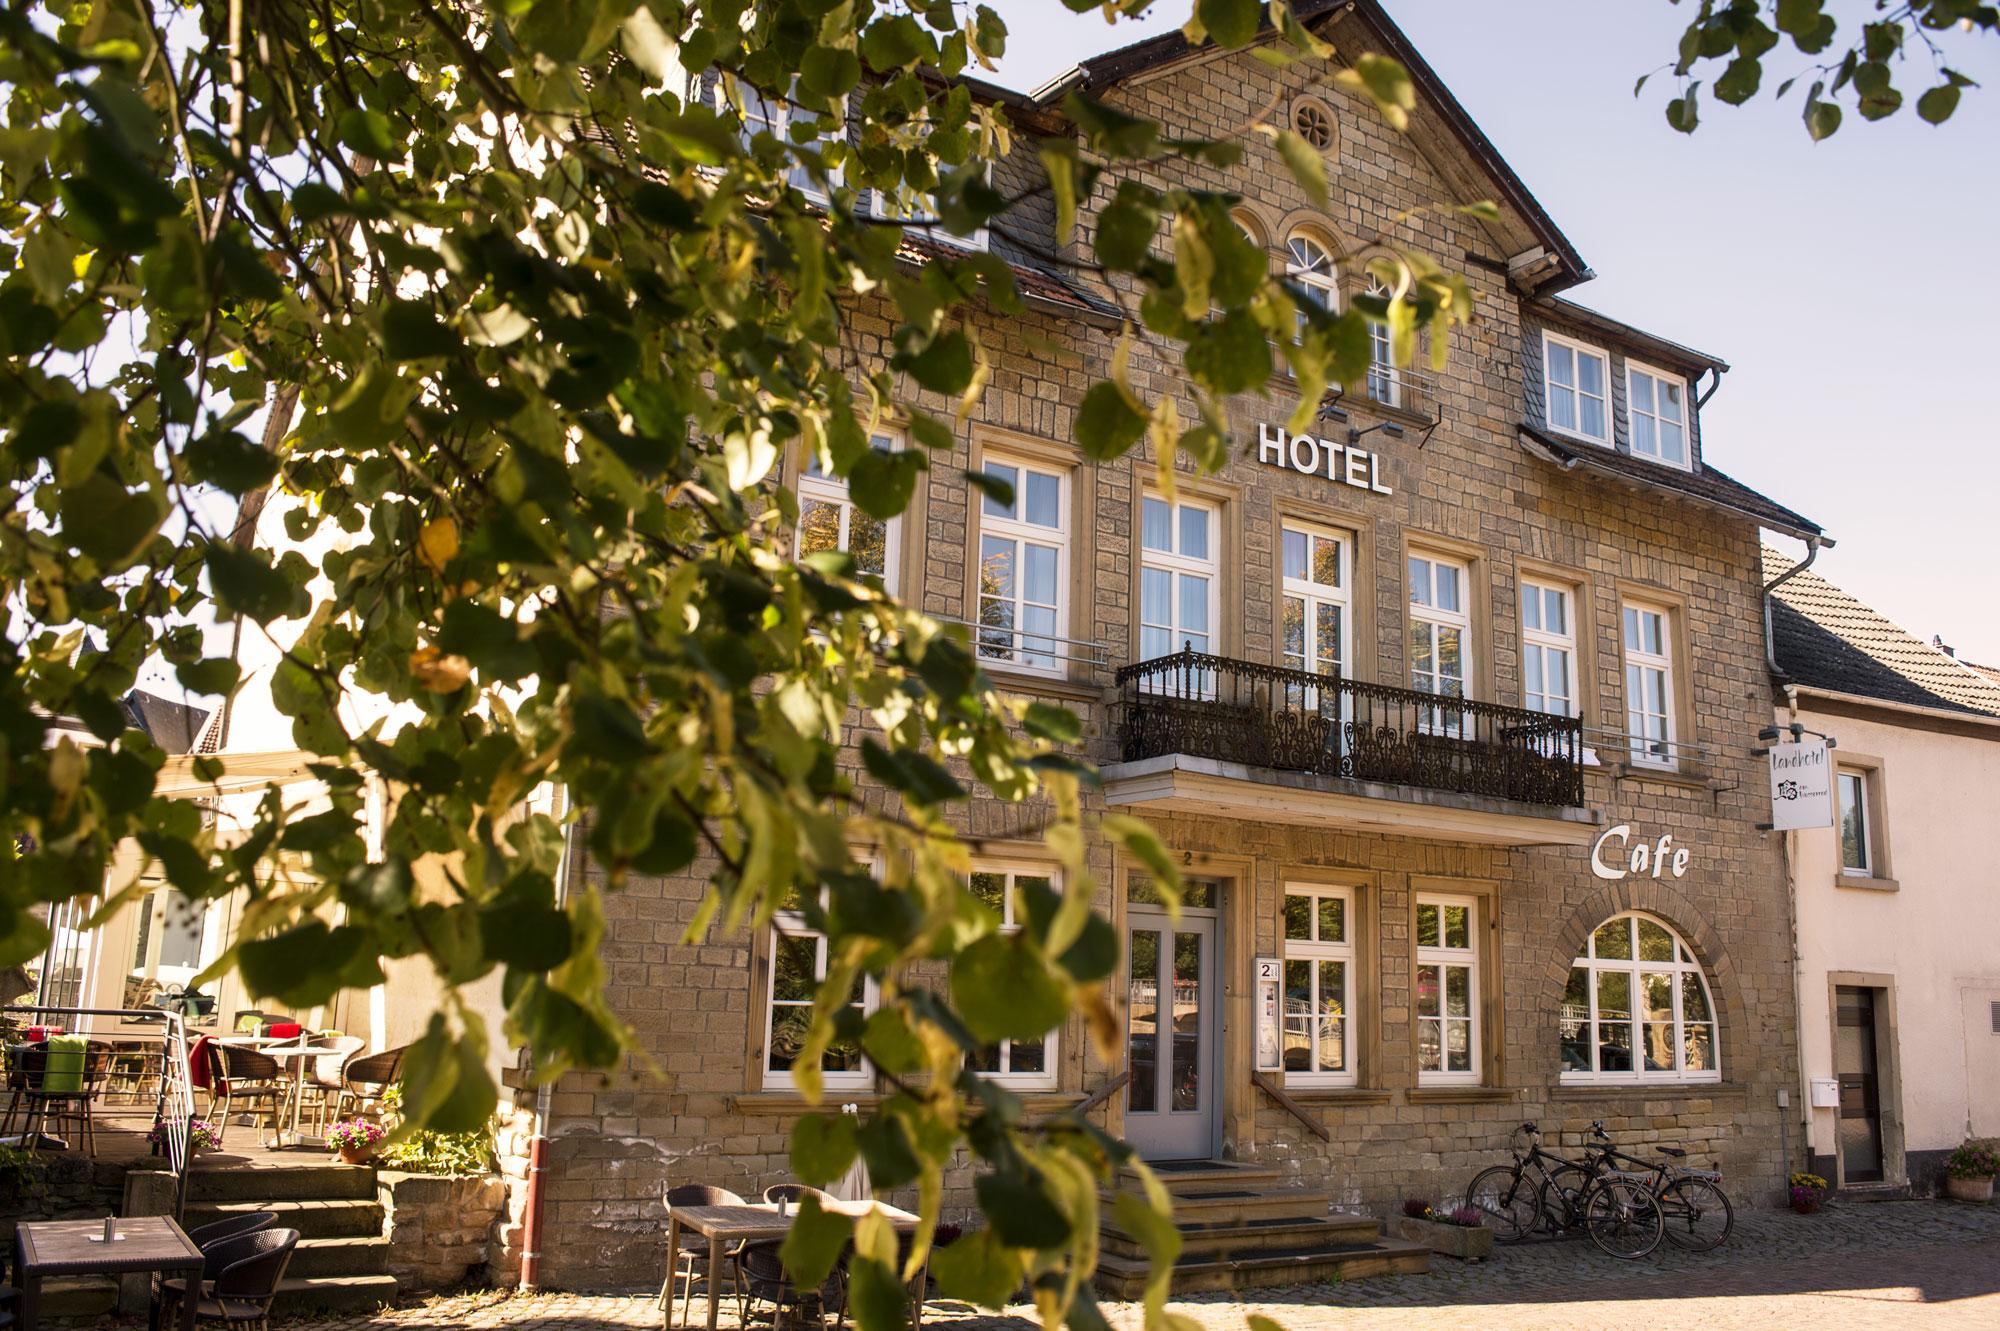 Hotel-Wasserrad-Front-2